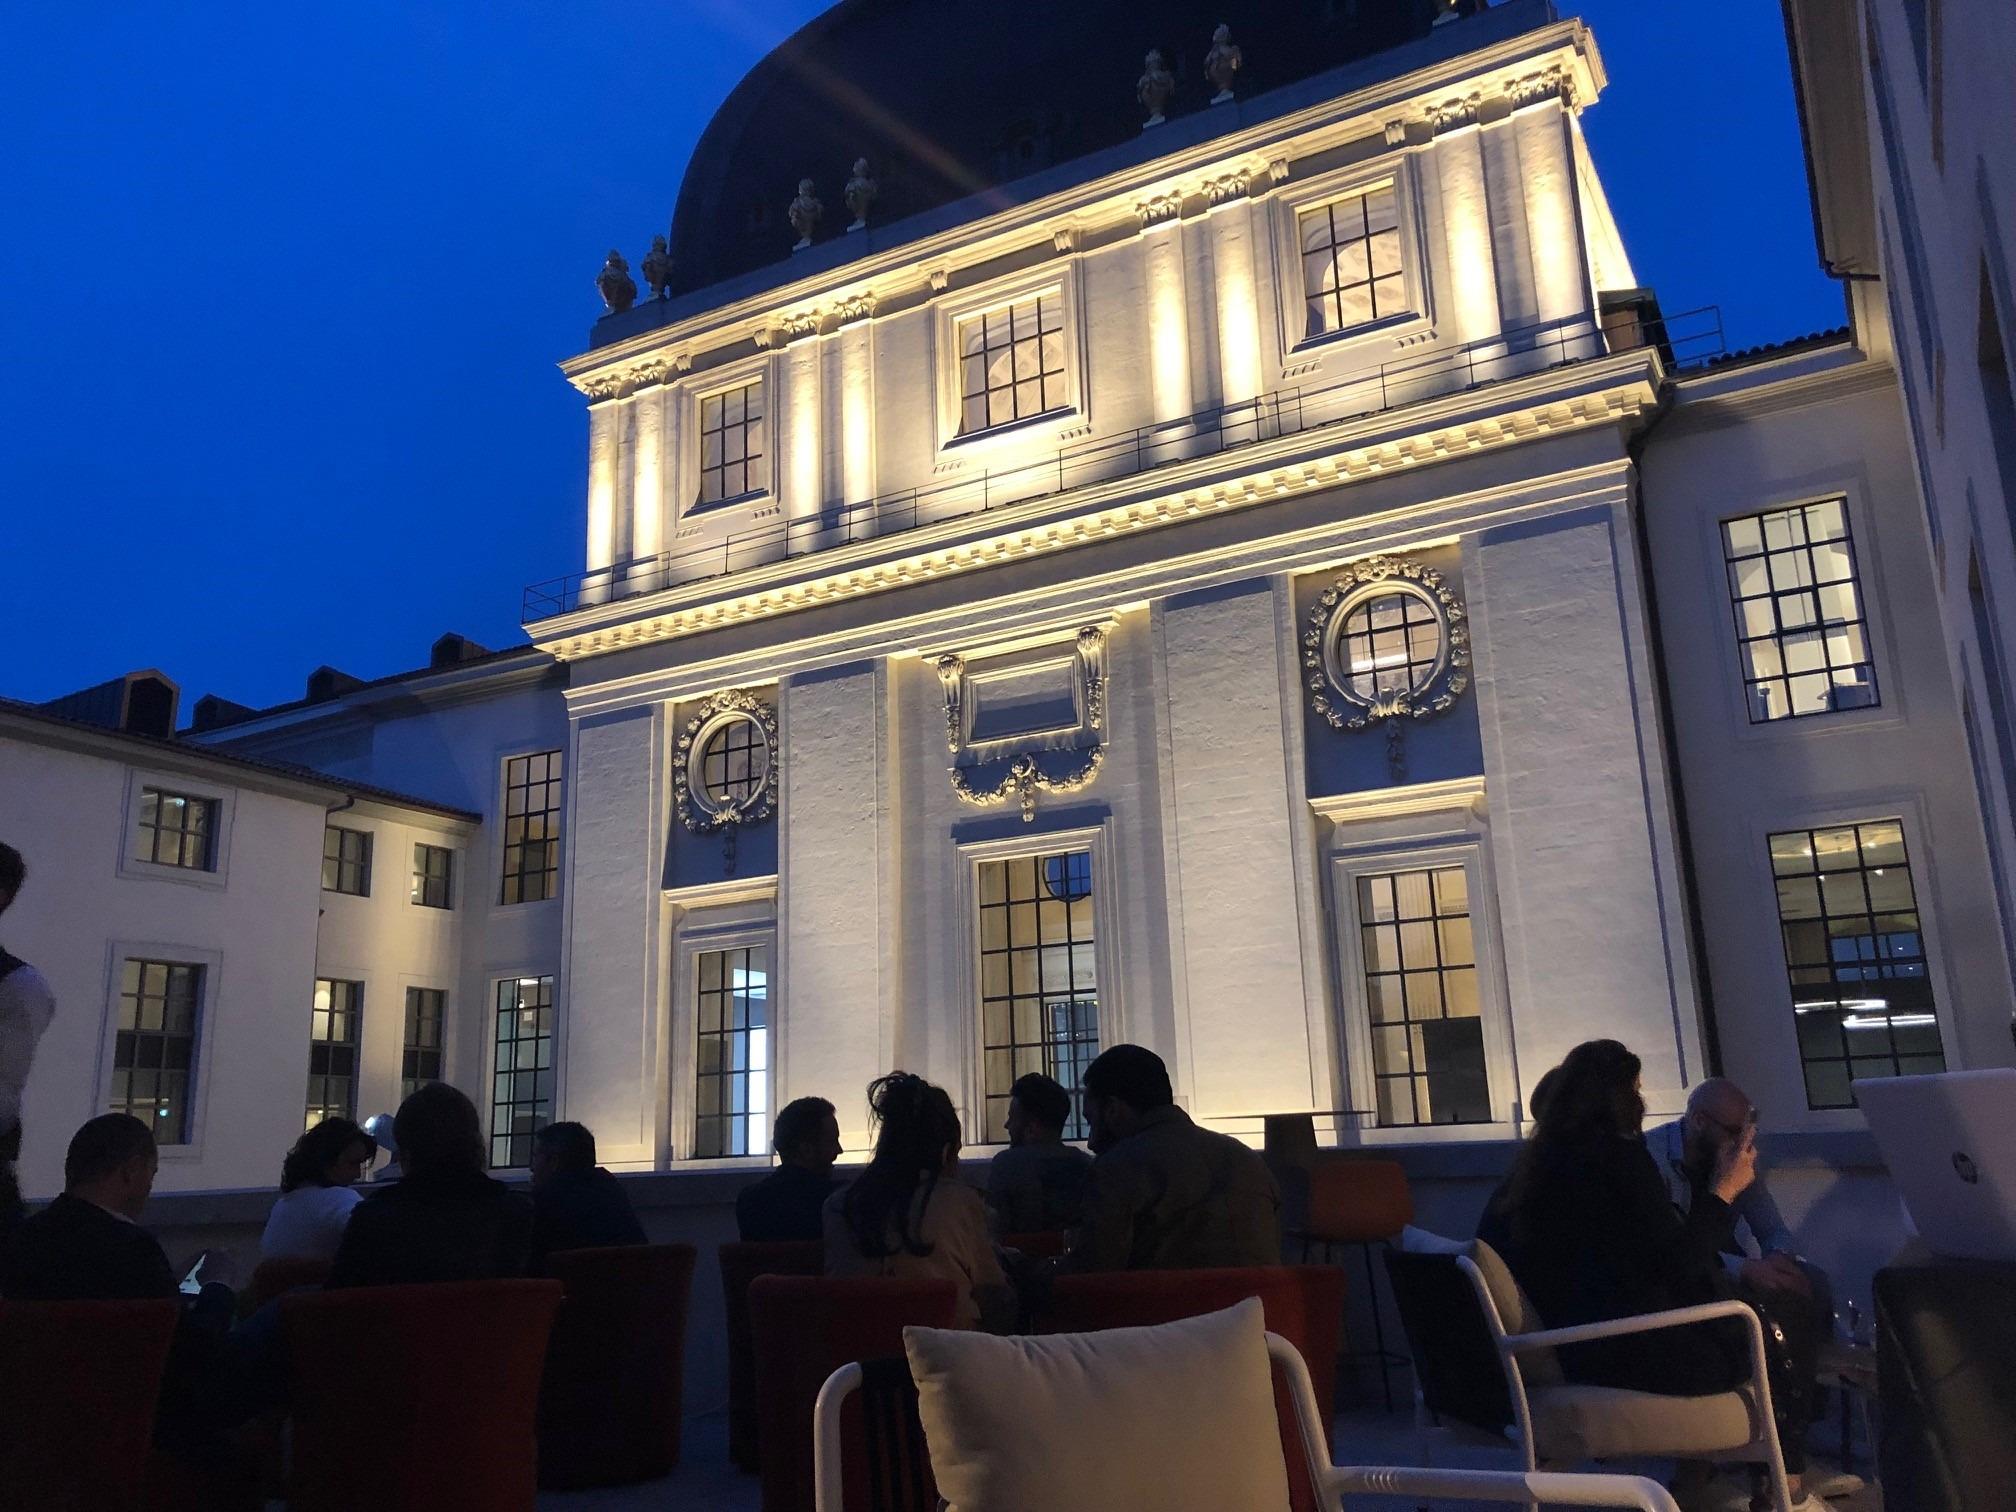 L'Officine terrasse de nuit